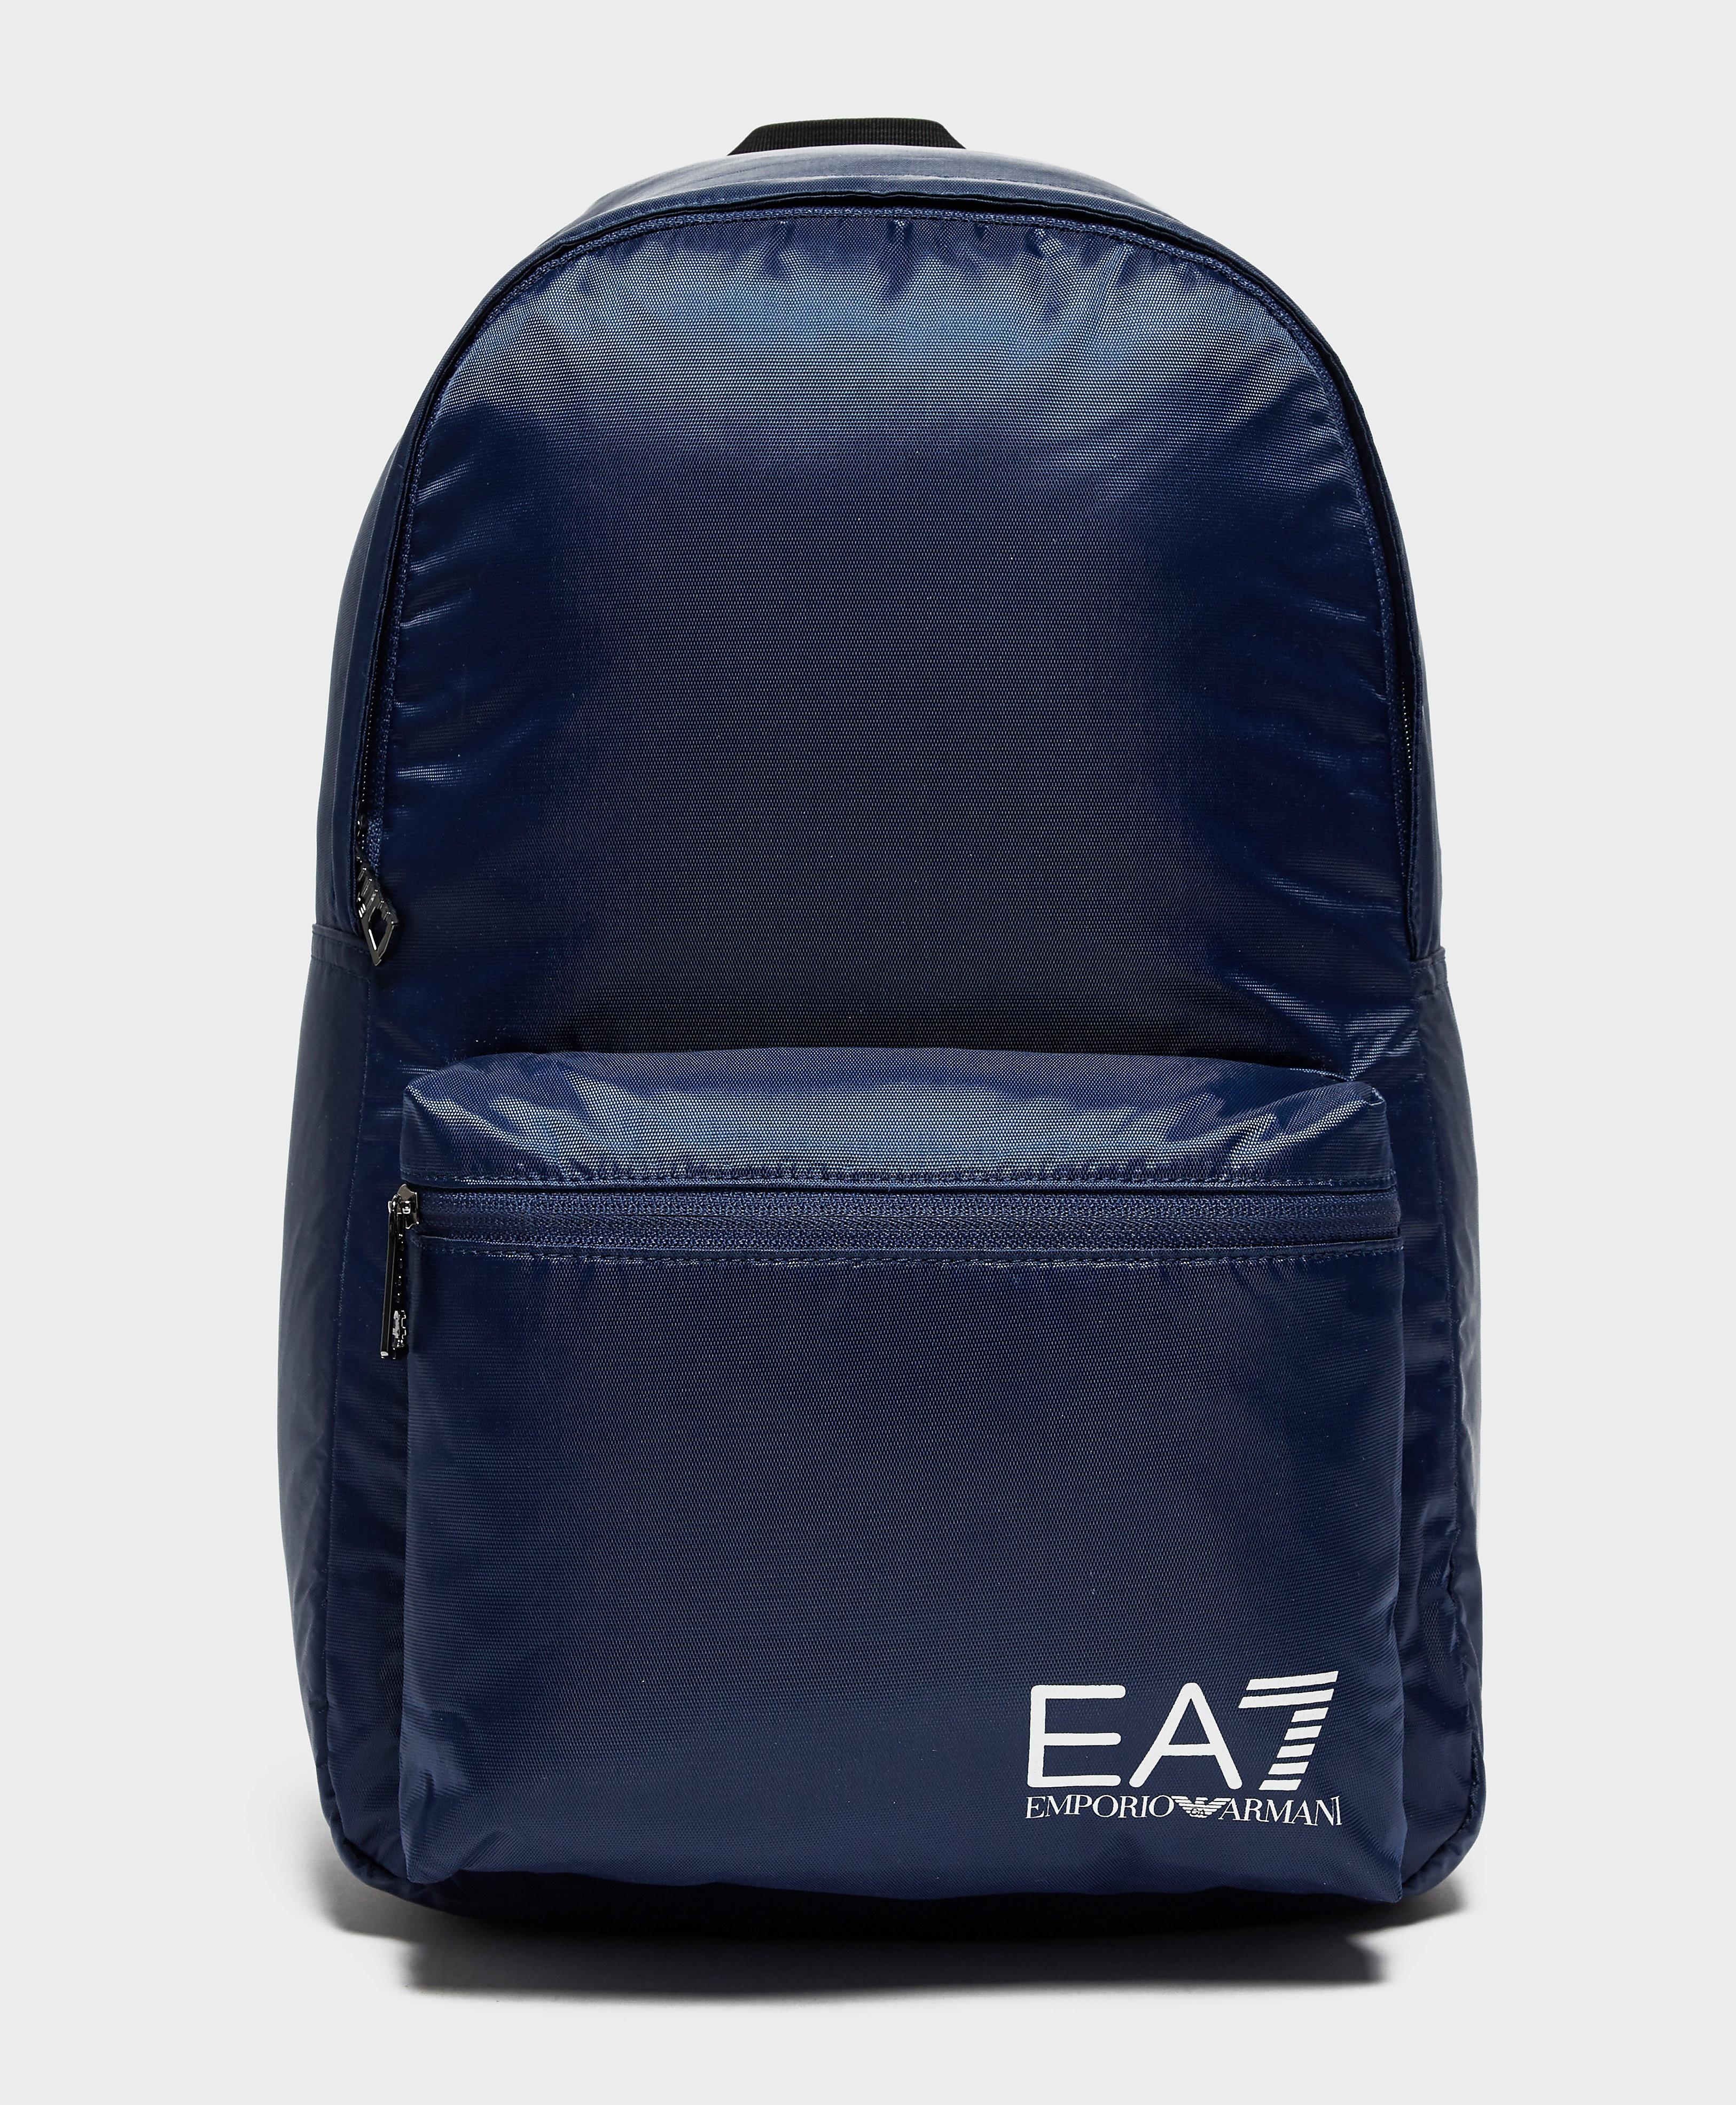 Emporio Armani EA7 Train Logo Backpack